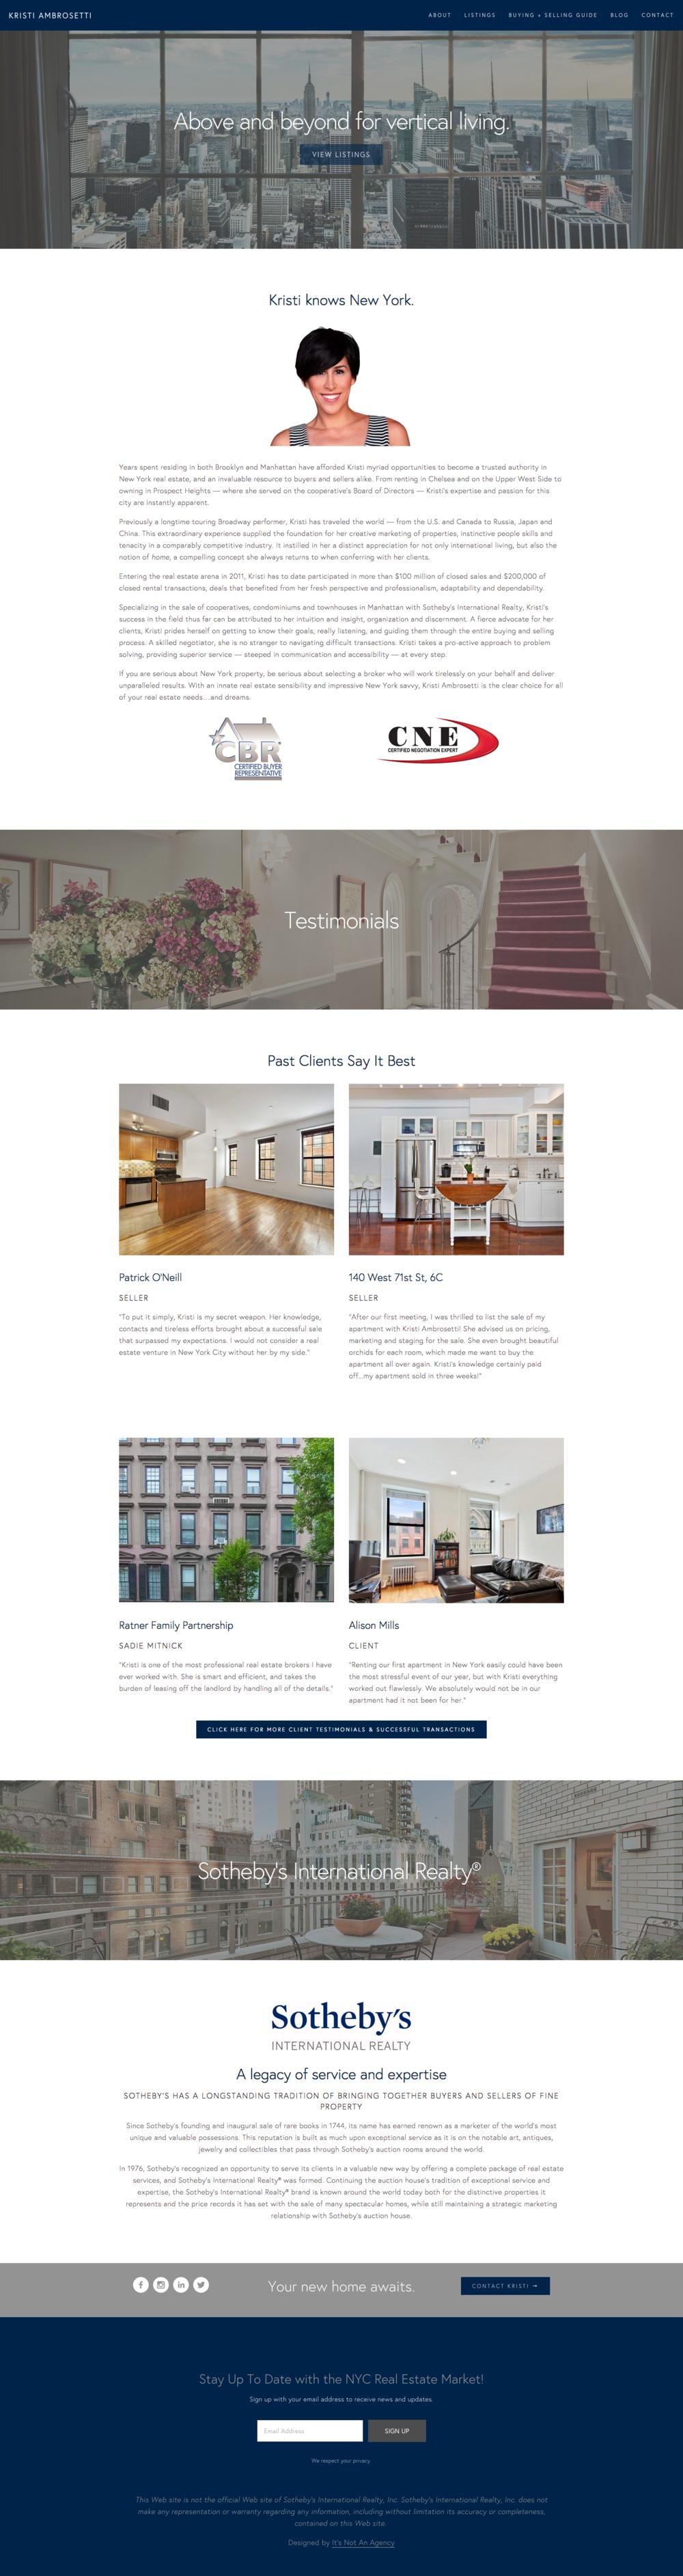 Real Estate Website_Kristi Ambrosetti3.png